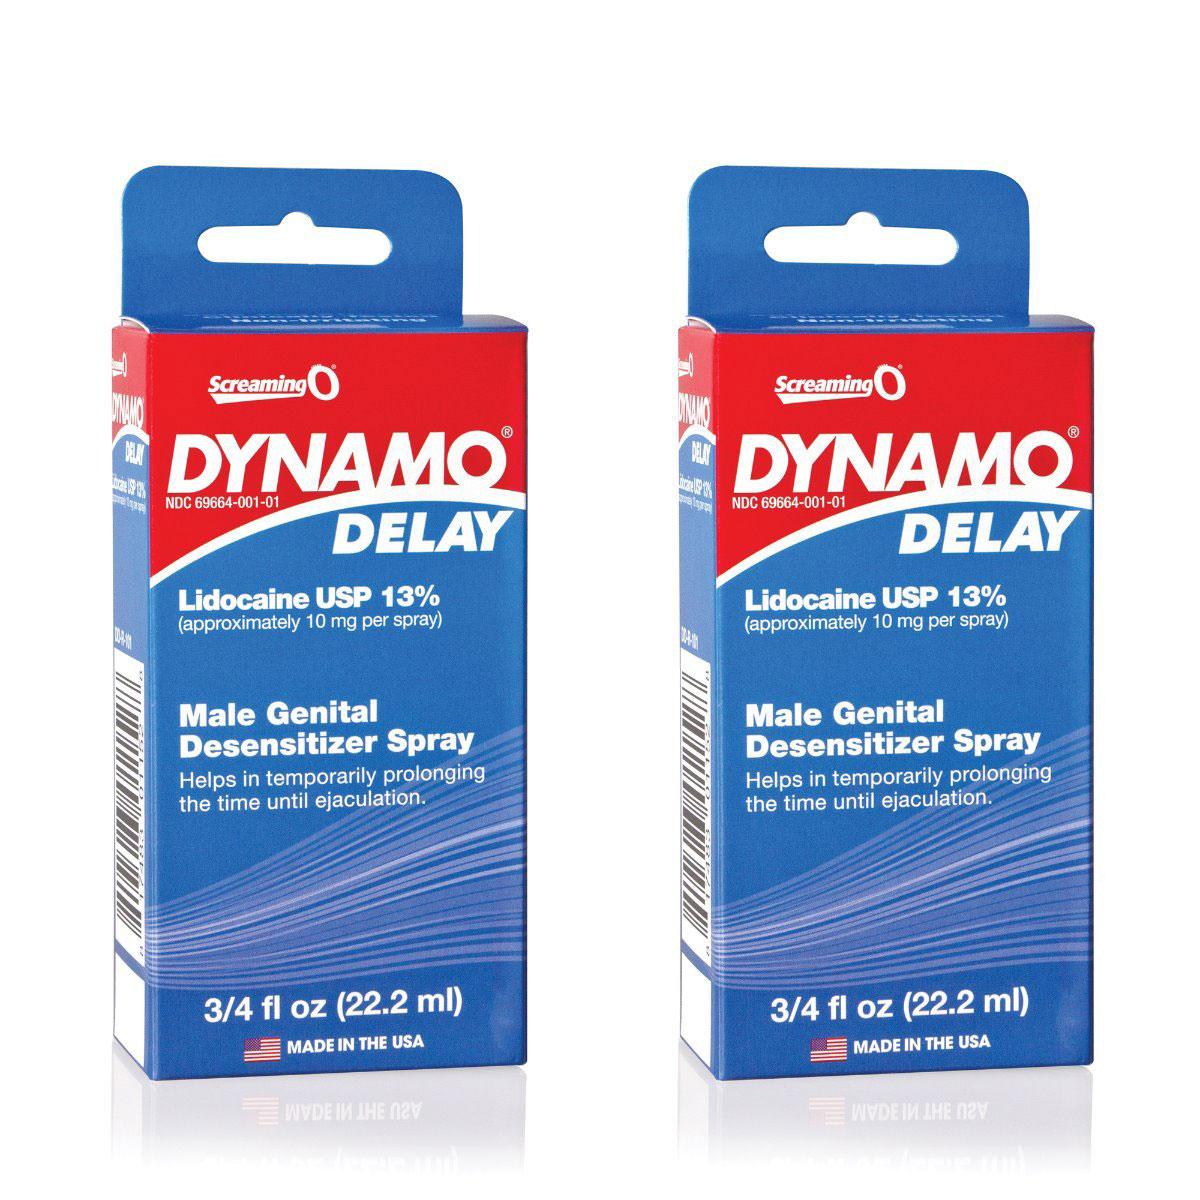 Thuoc xit tri xuat tinh som Dynamo Delay